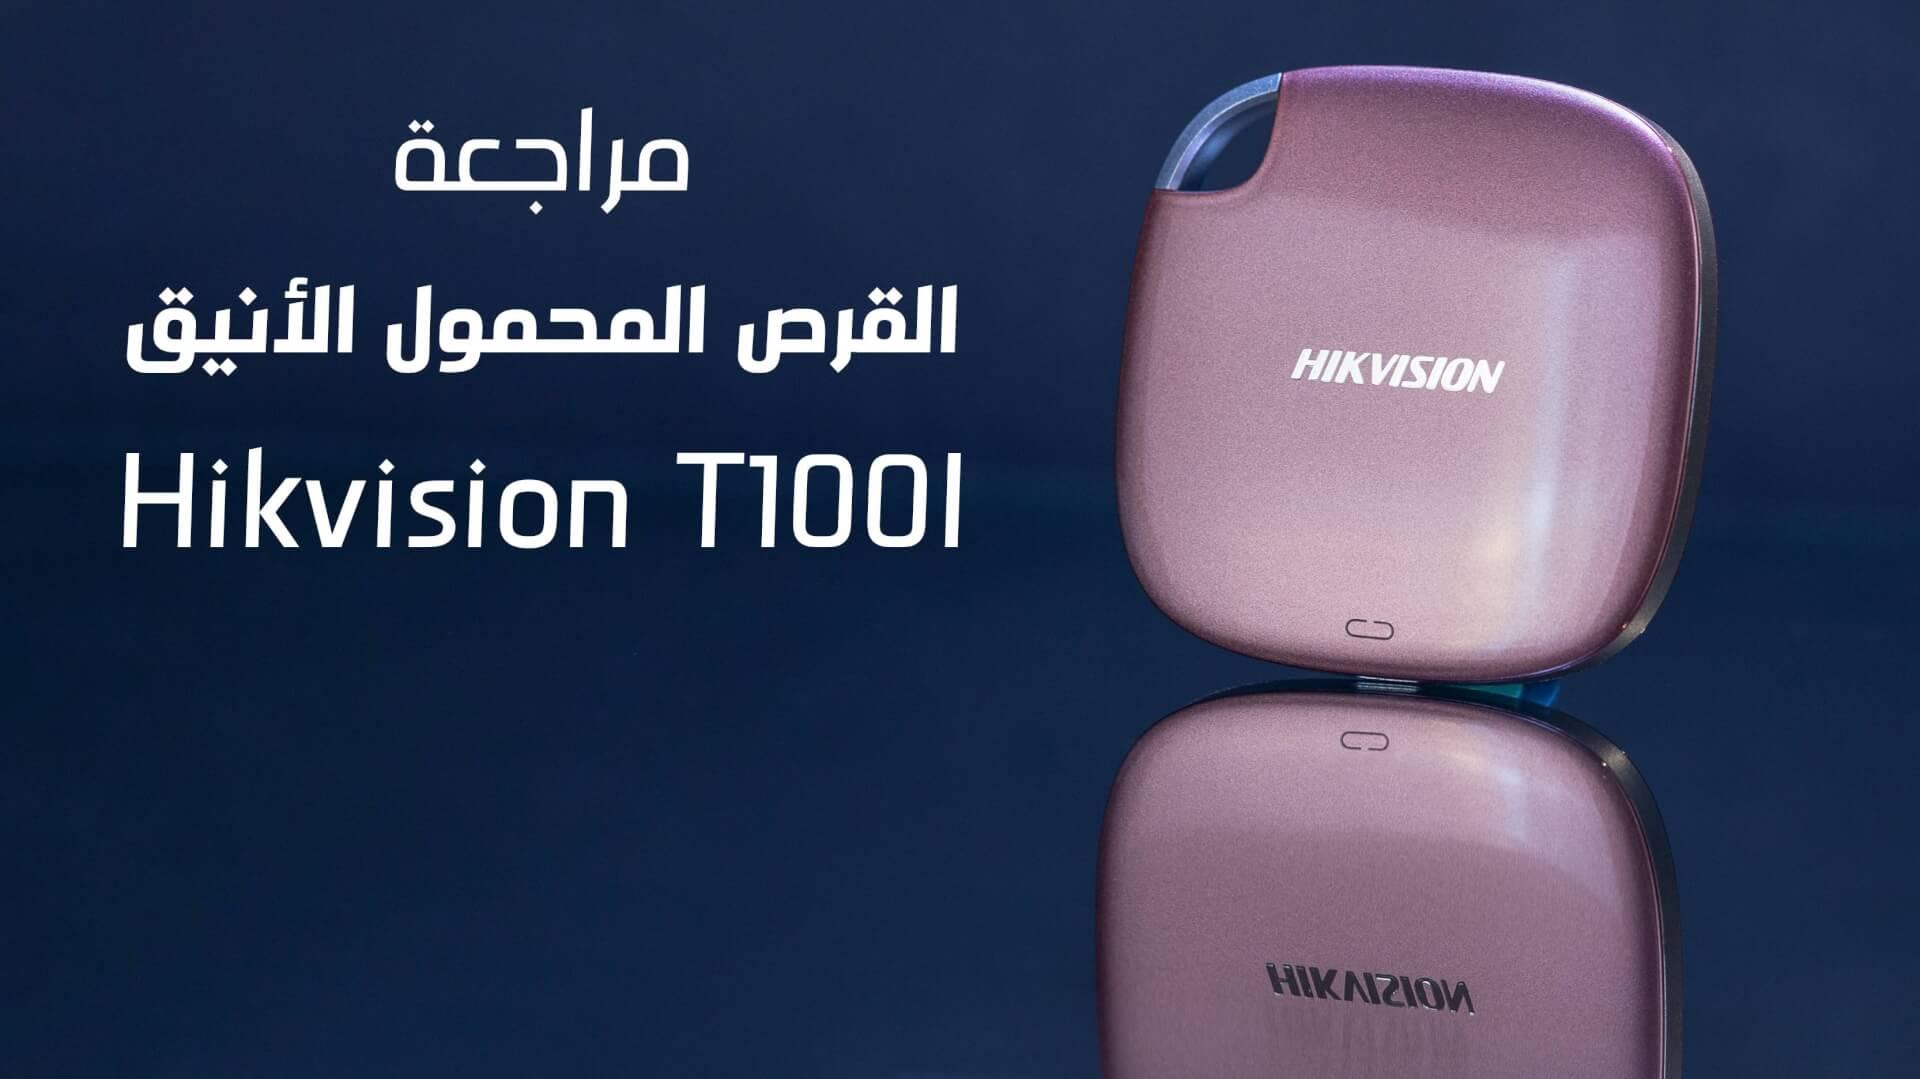 Hikvision T100I